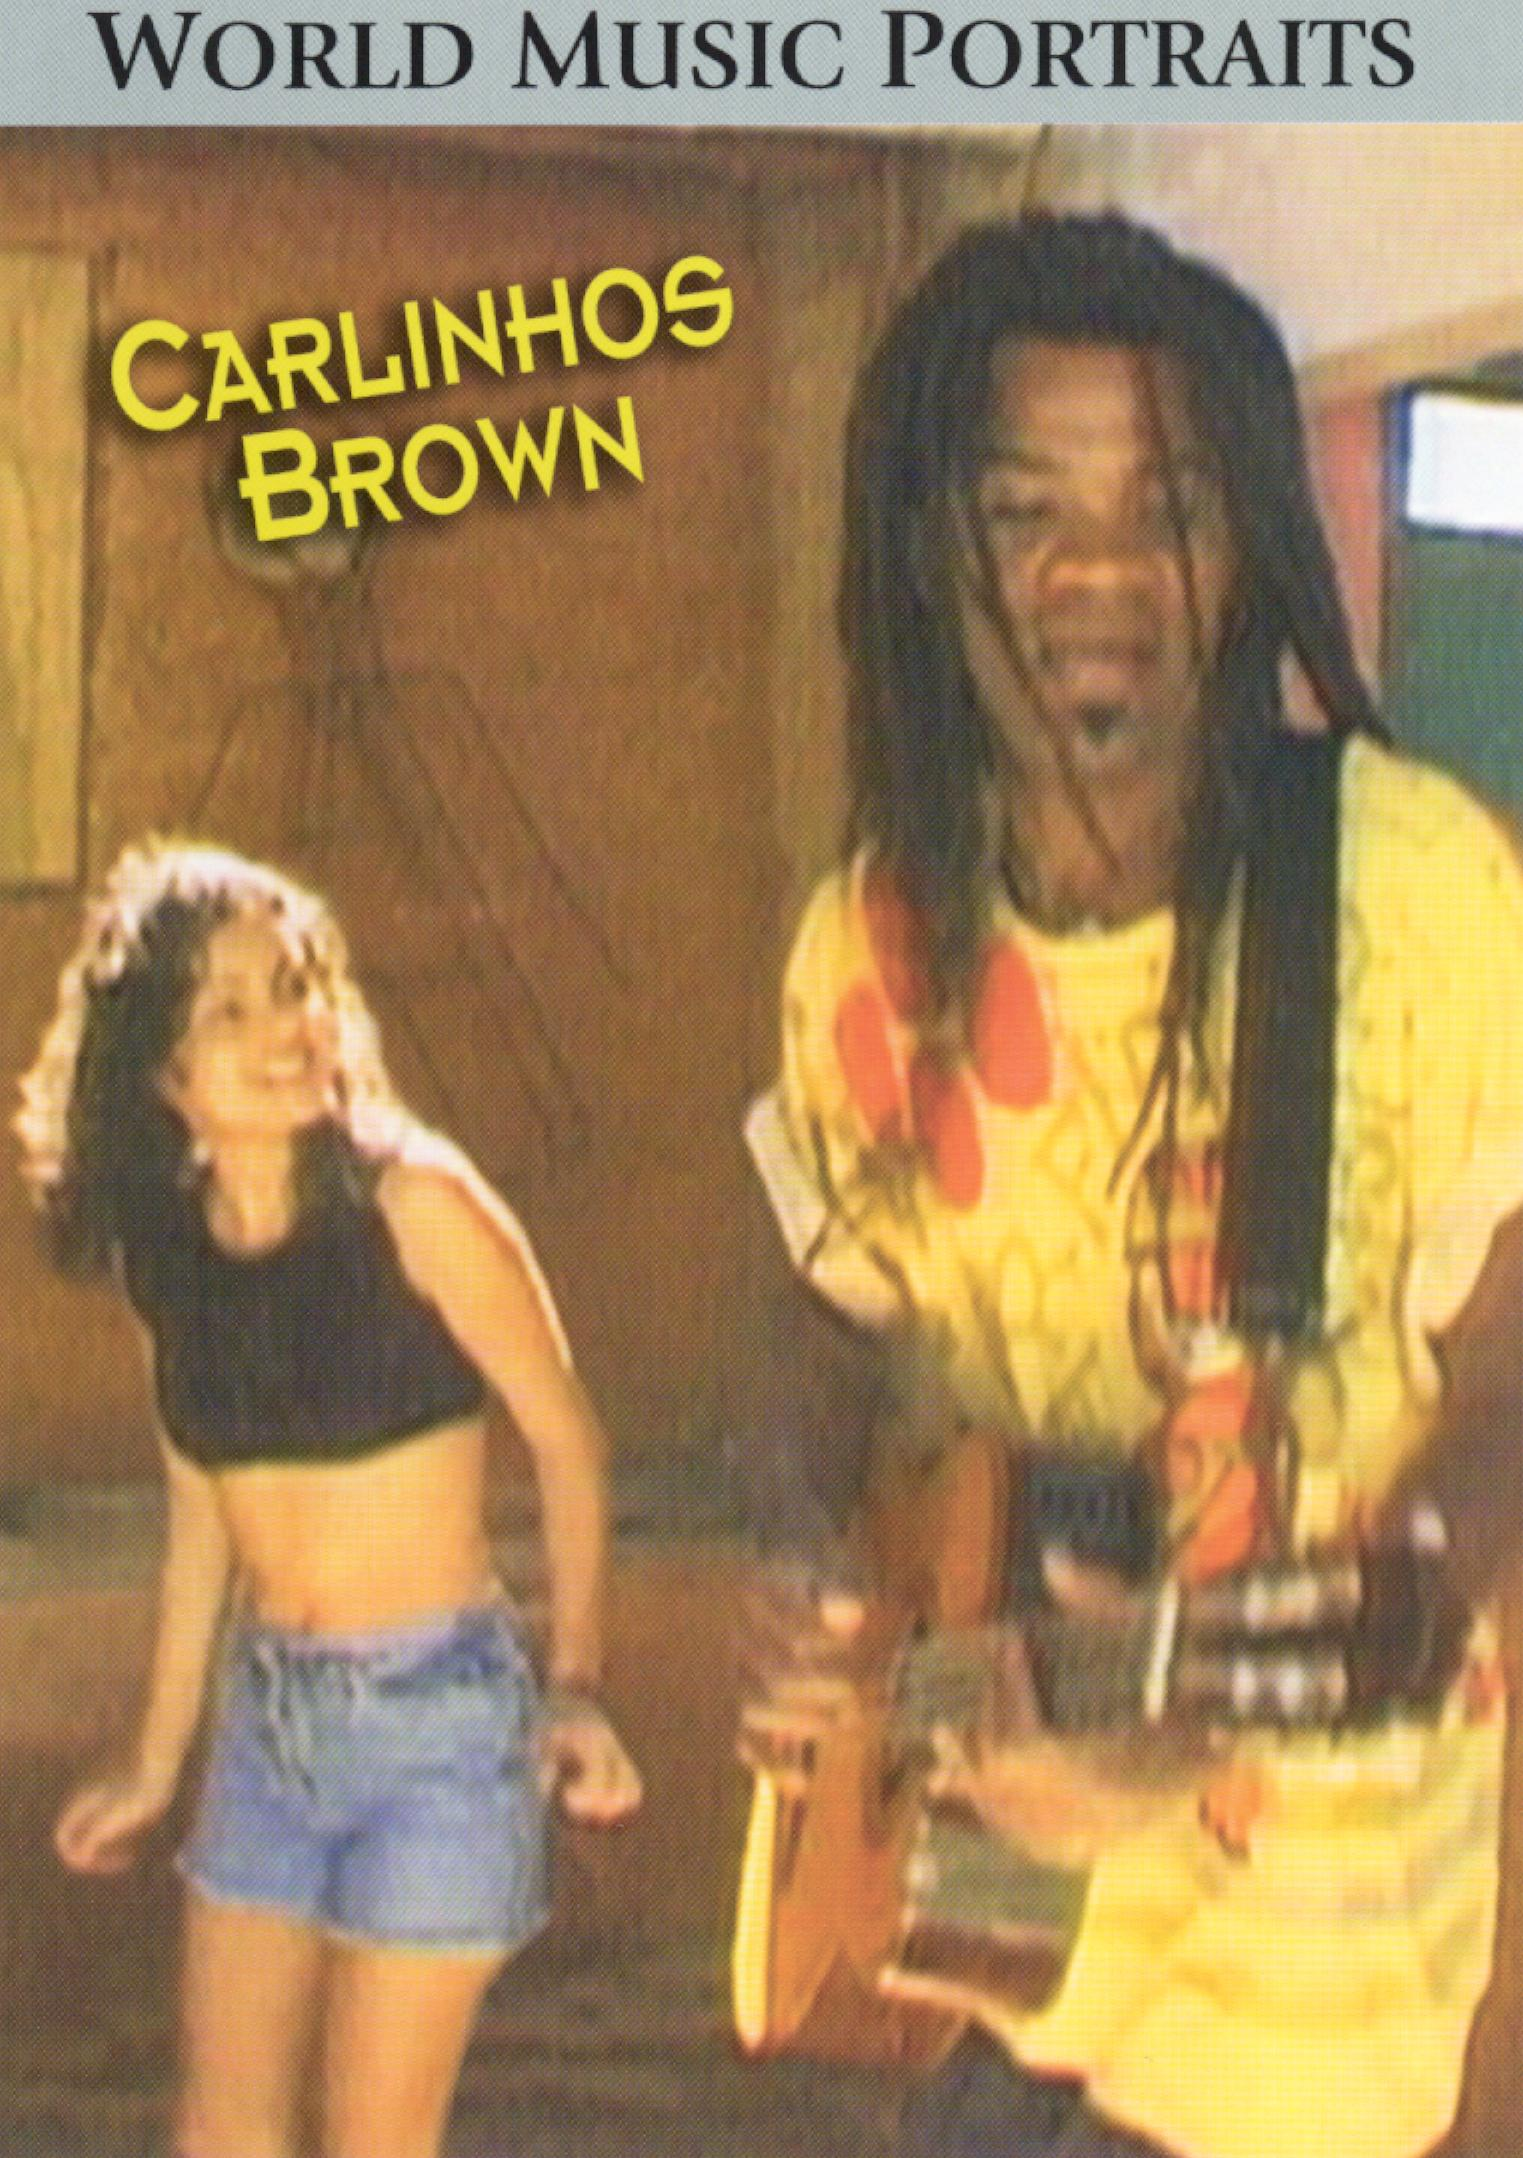 World Music Portraits: Carlinhos Brown